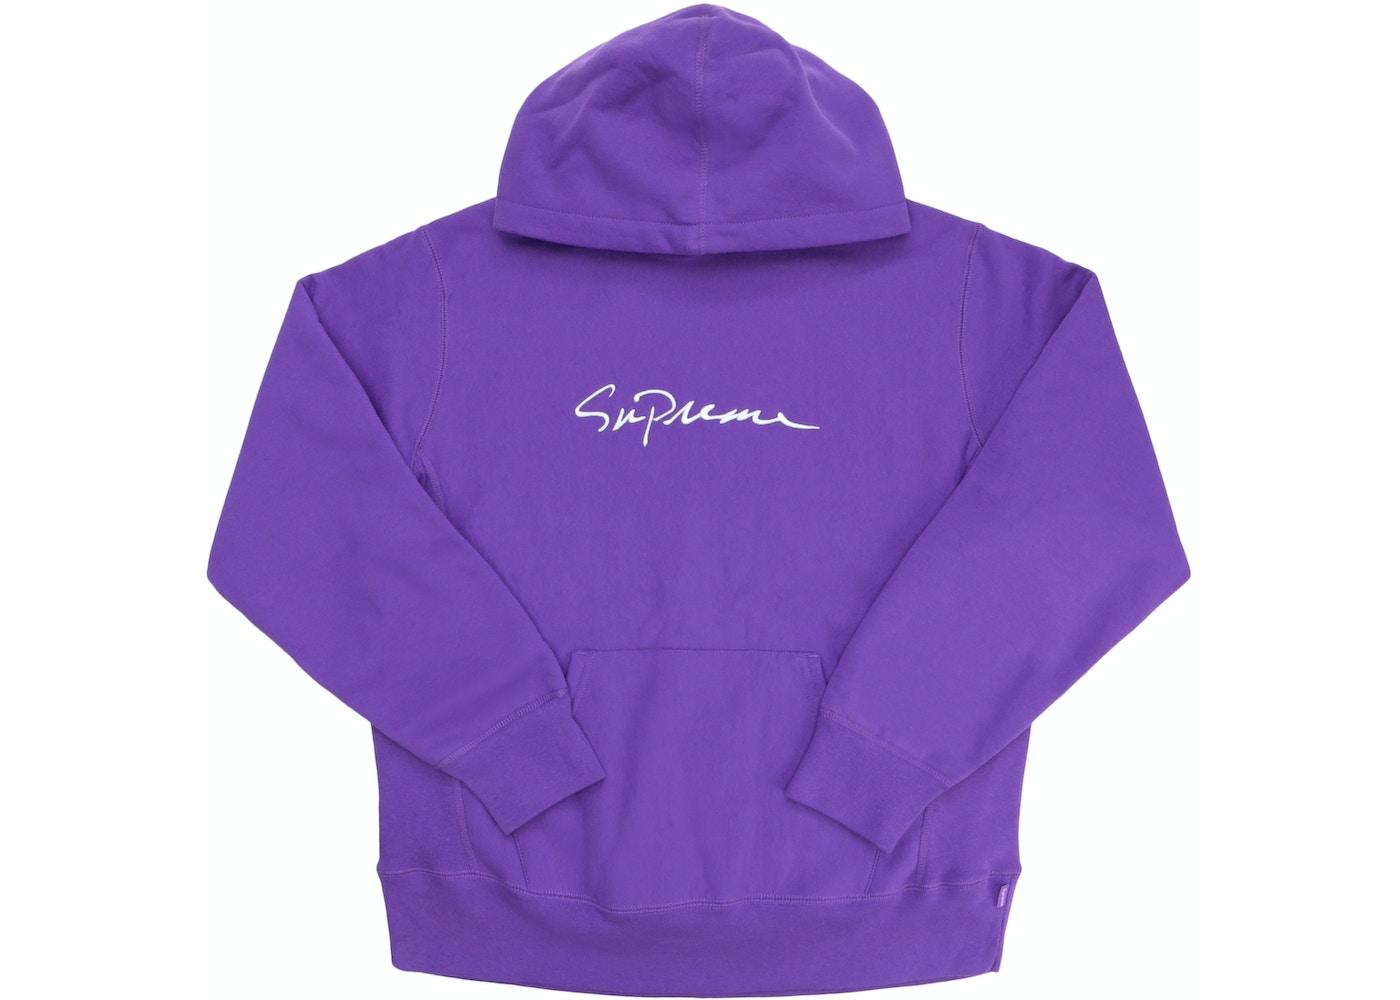 60c4e43f6003 Supreme Classic Script Hooded Sweatshirt Violet - FW18